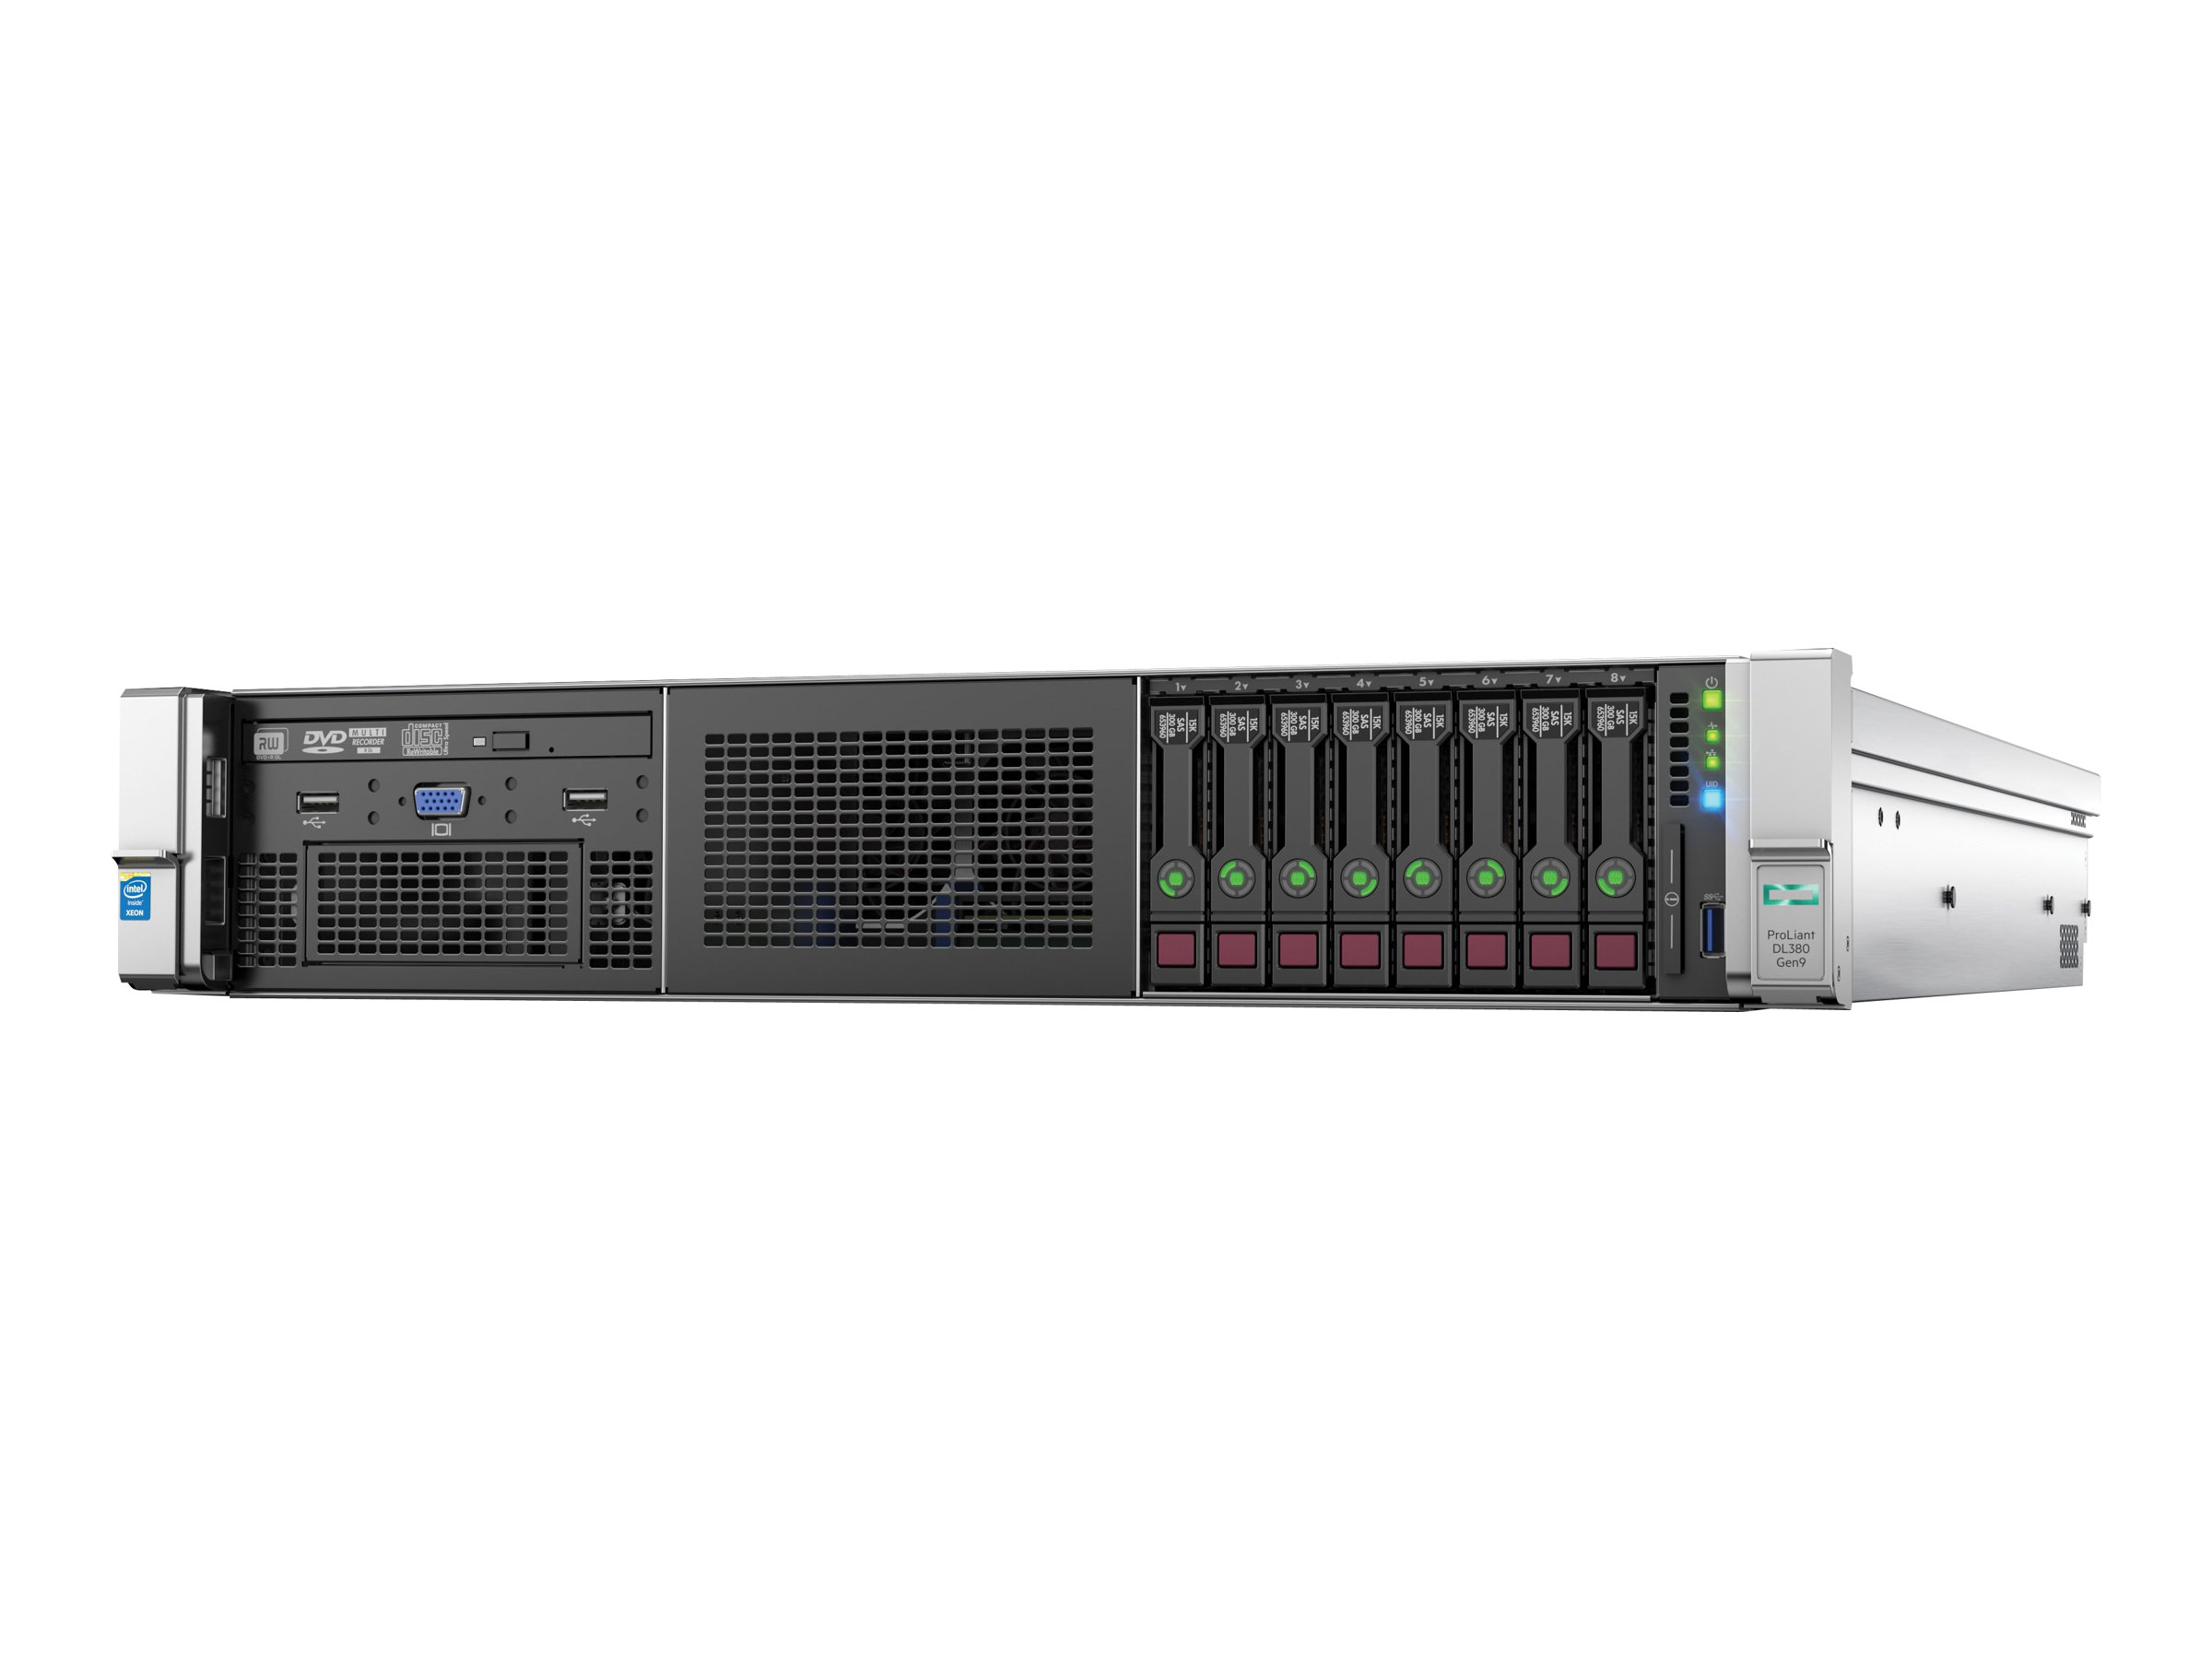 HPE DL380 Gen9 E5-2620v3 1P 16G 8SFF Svr (752687-B21) - REFURB